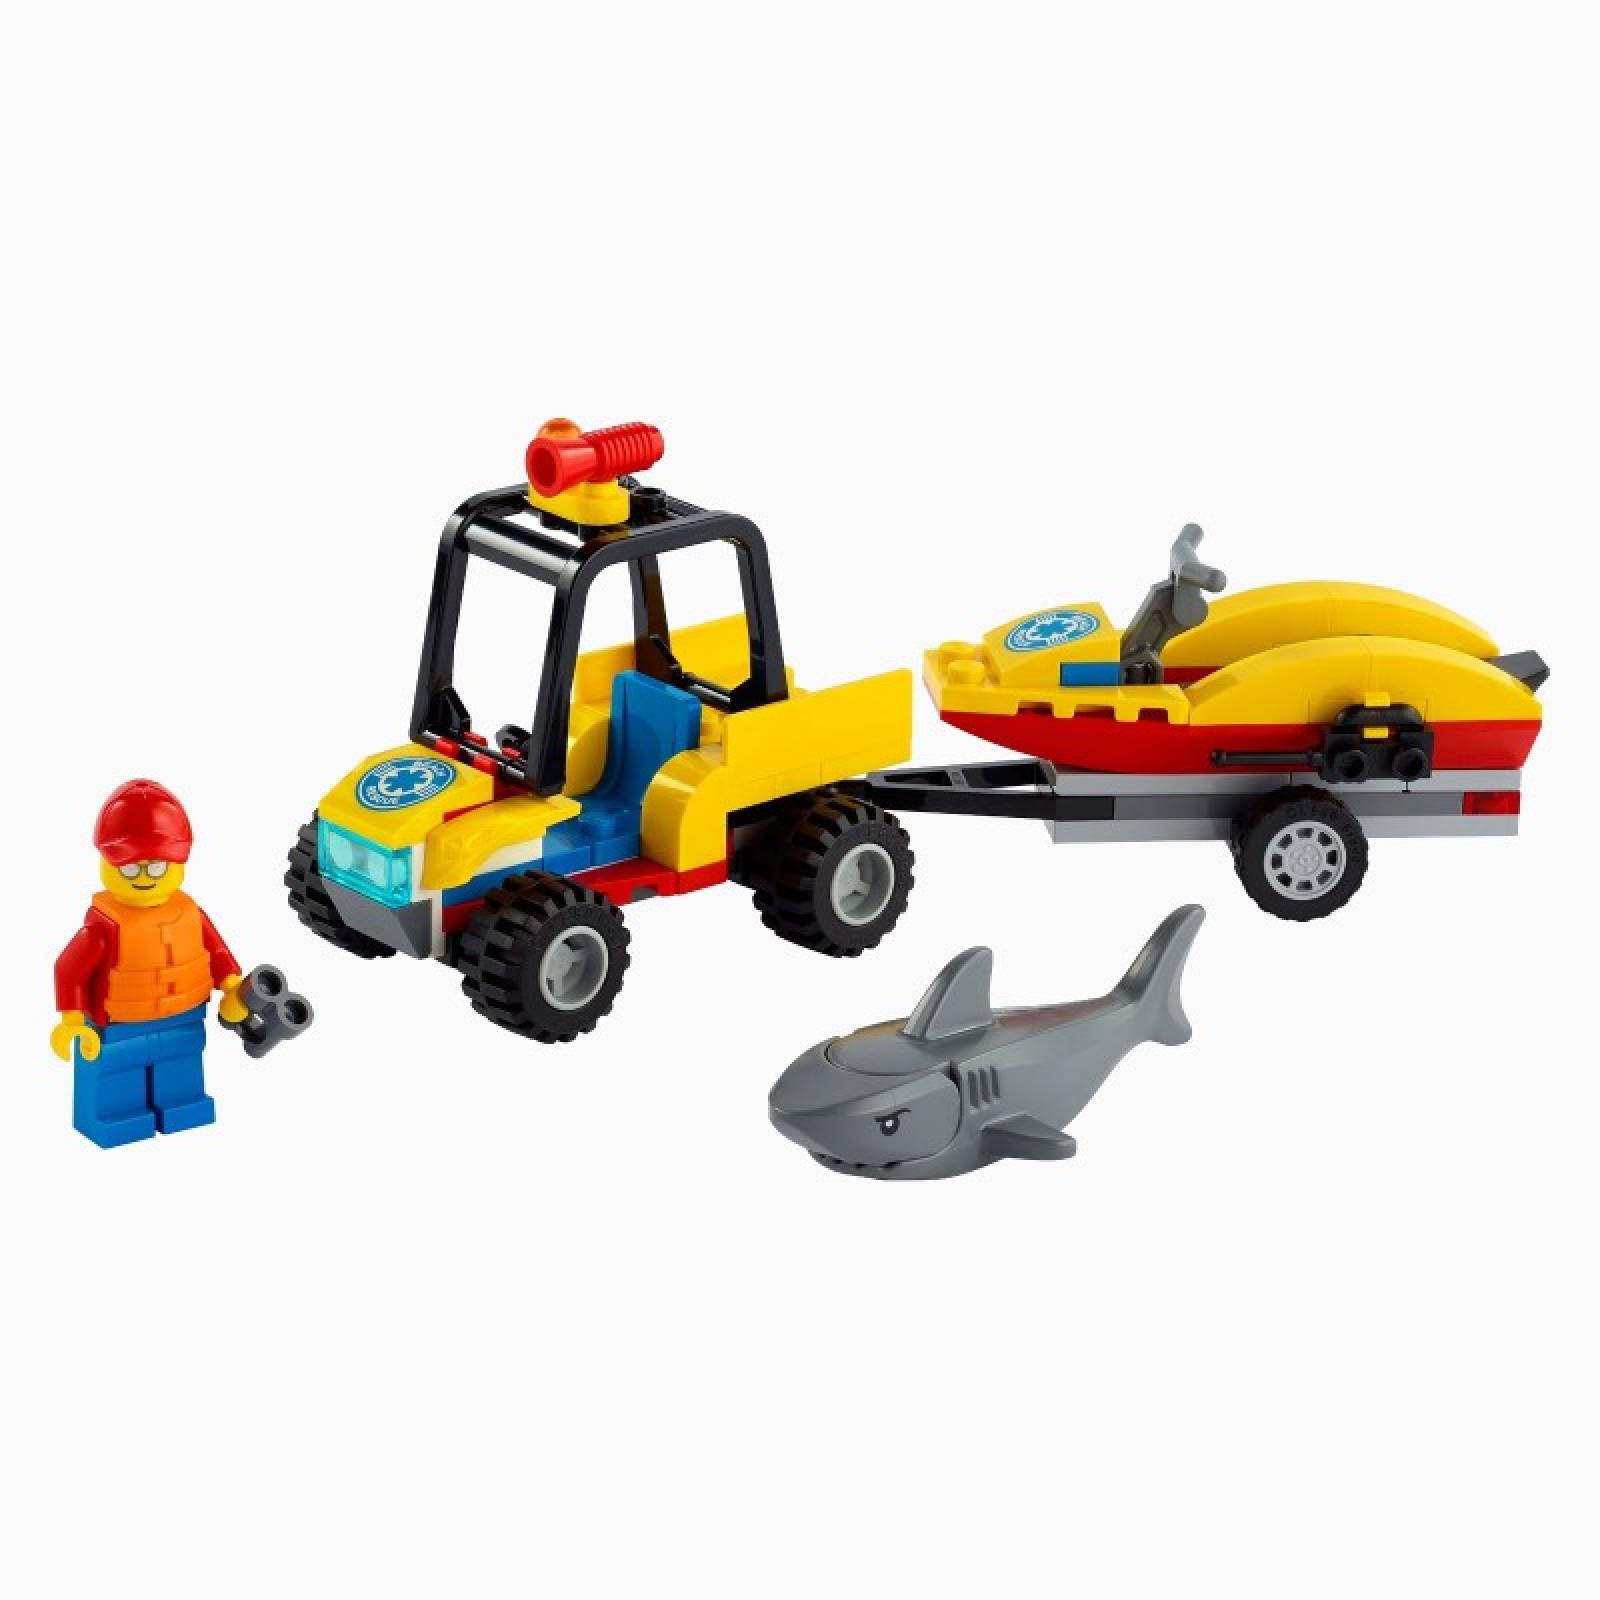 LEGO City Beach Rescue ATV 60286 5+ thumbnails